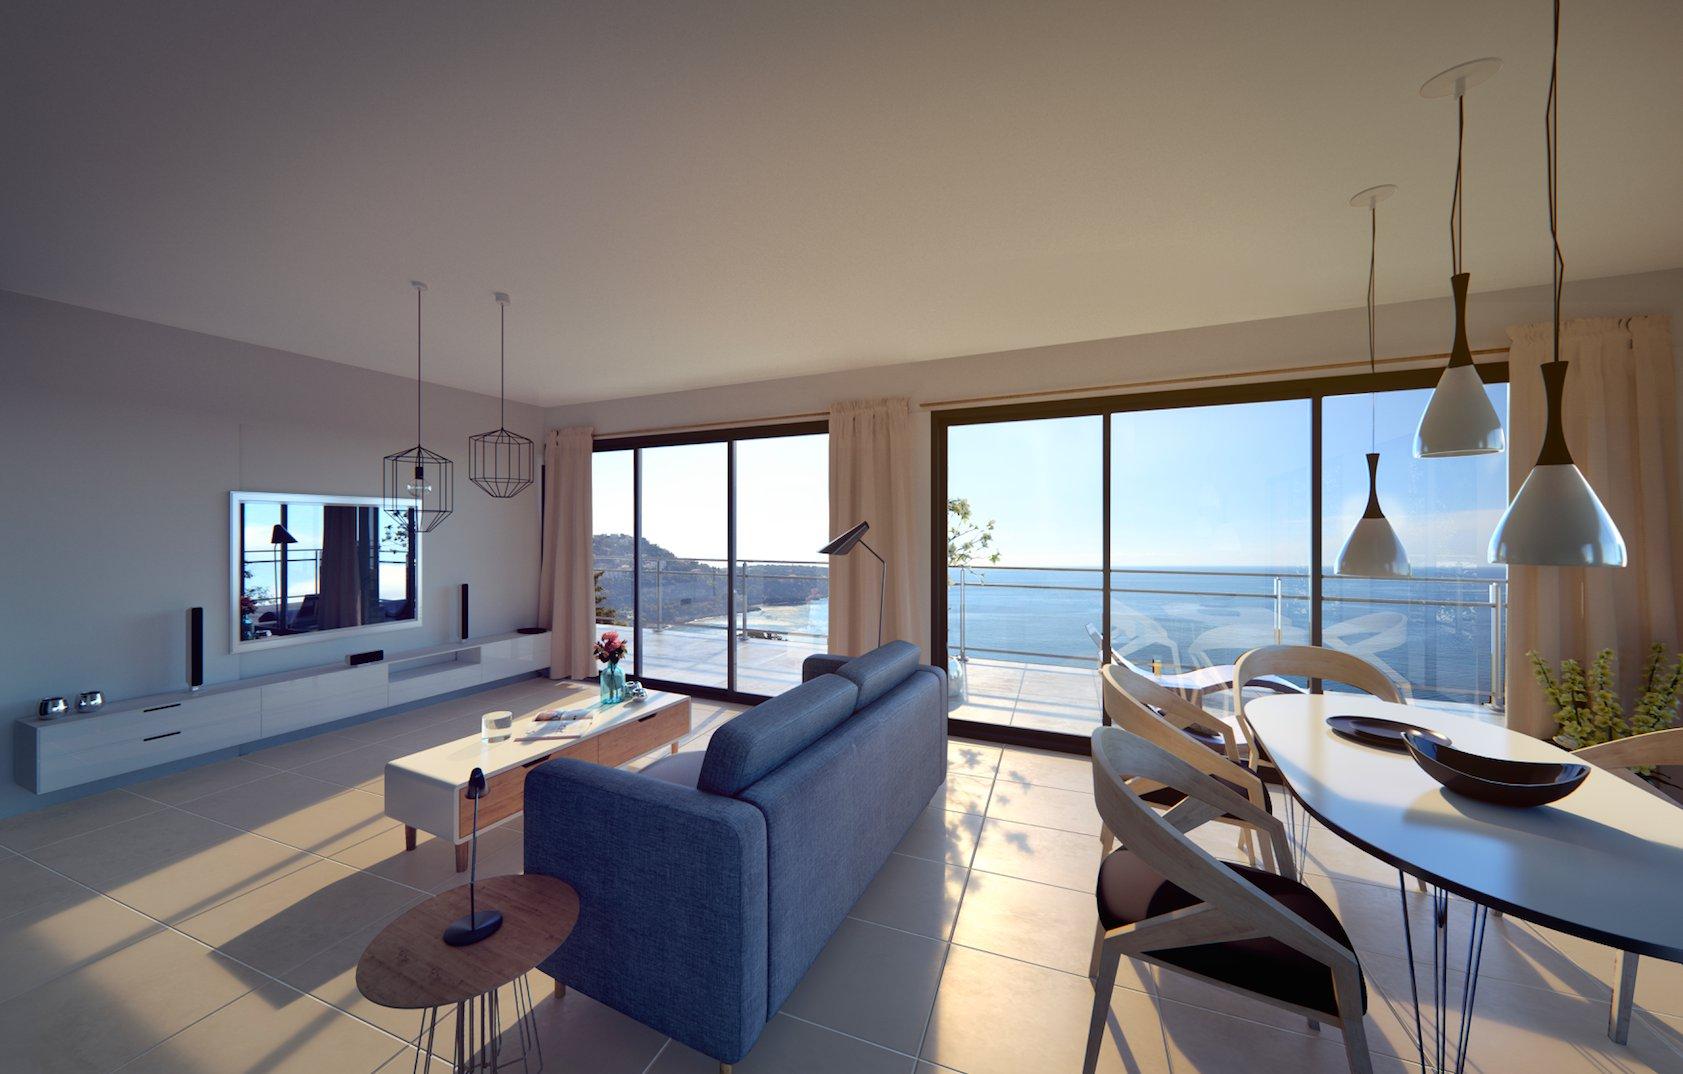 ROQUEBRUNE CAP MARTIN/CABBÉ: 1-BEDROOM APARTMENT, SEA VIEW WITH GARDEN